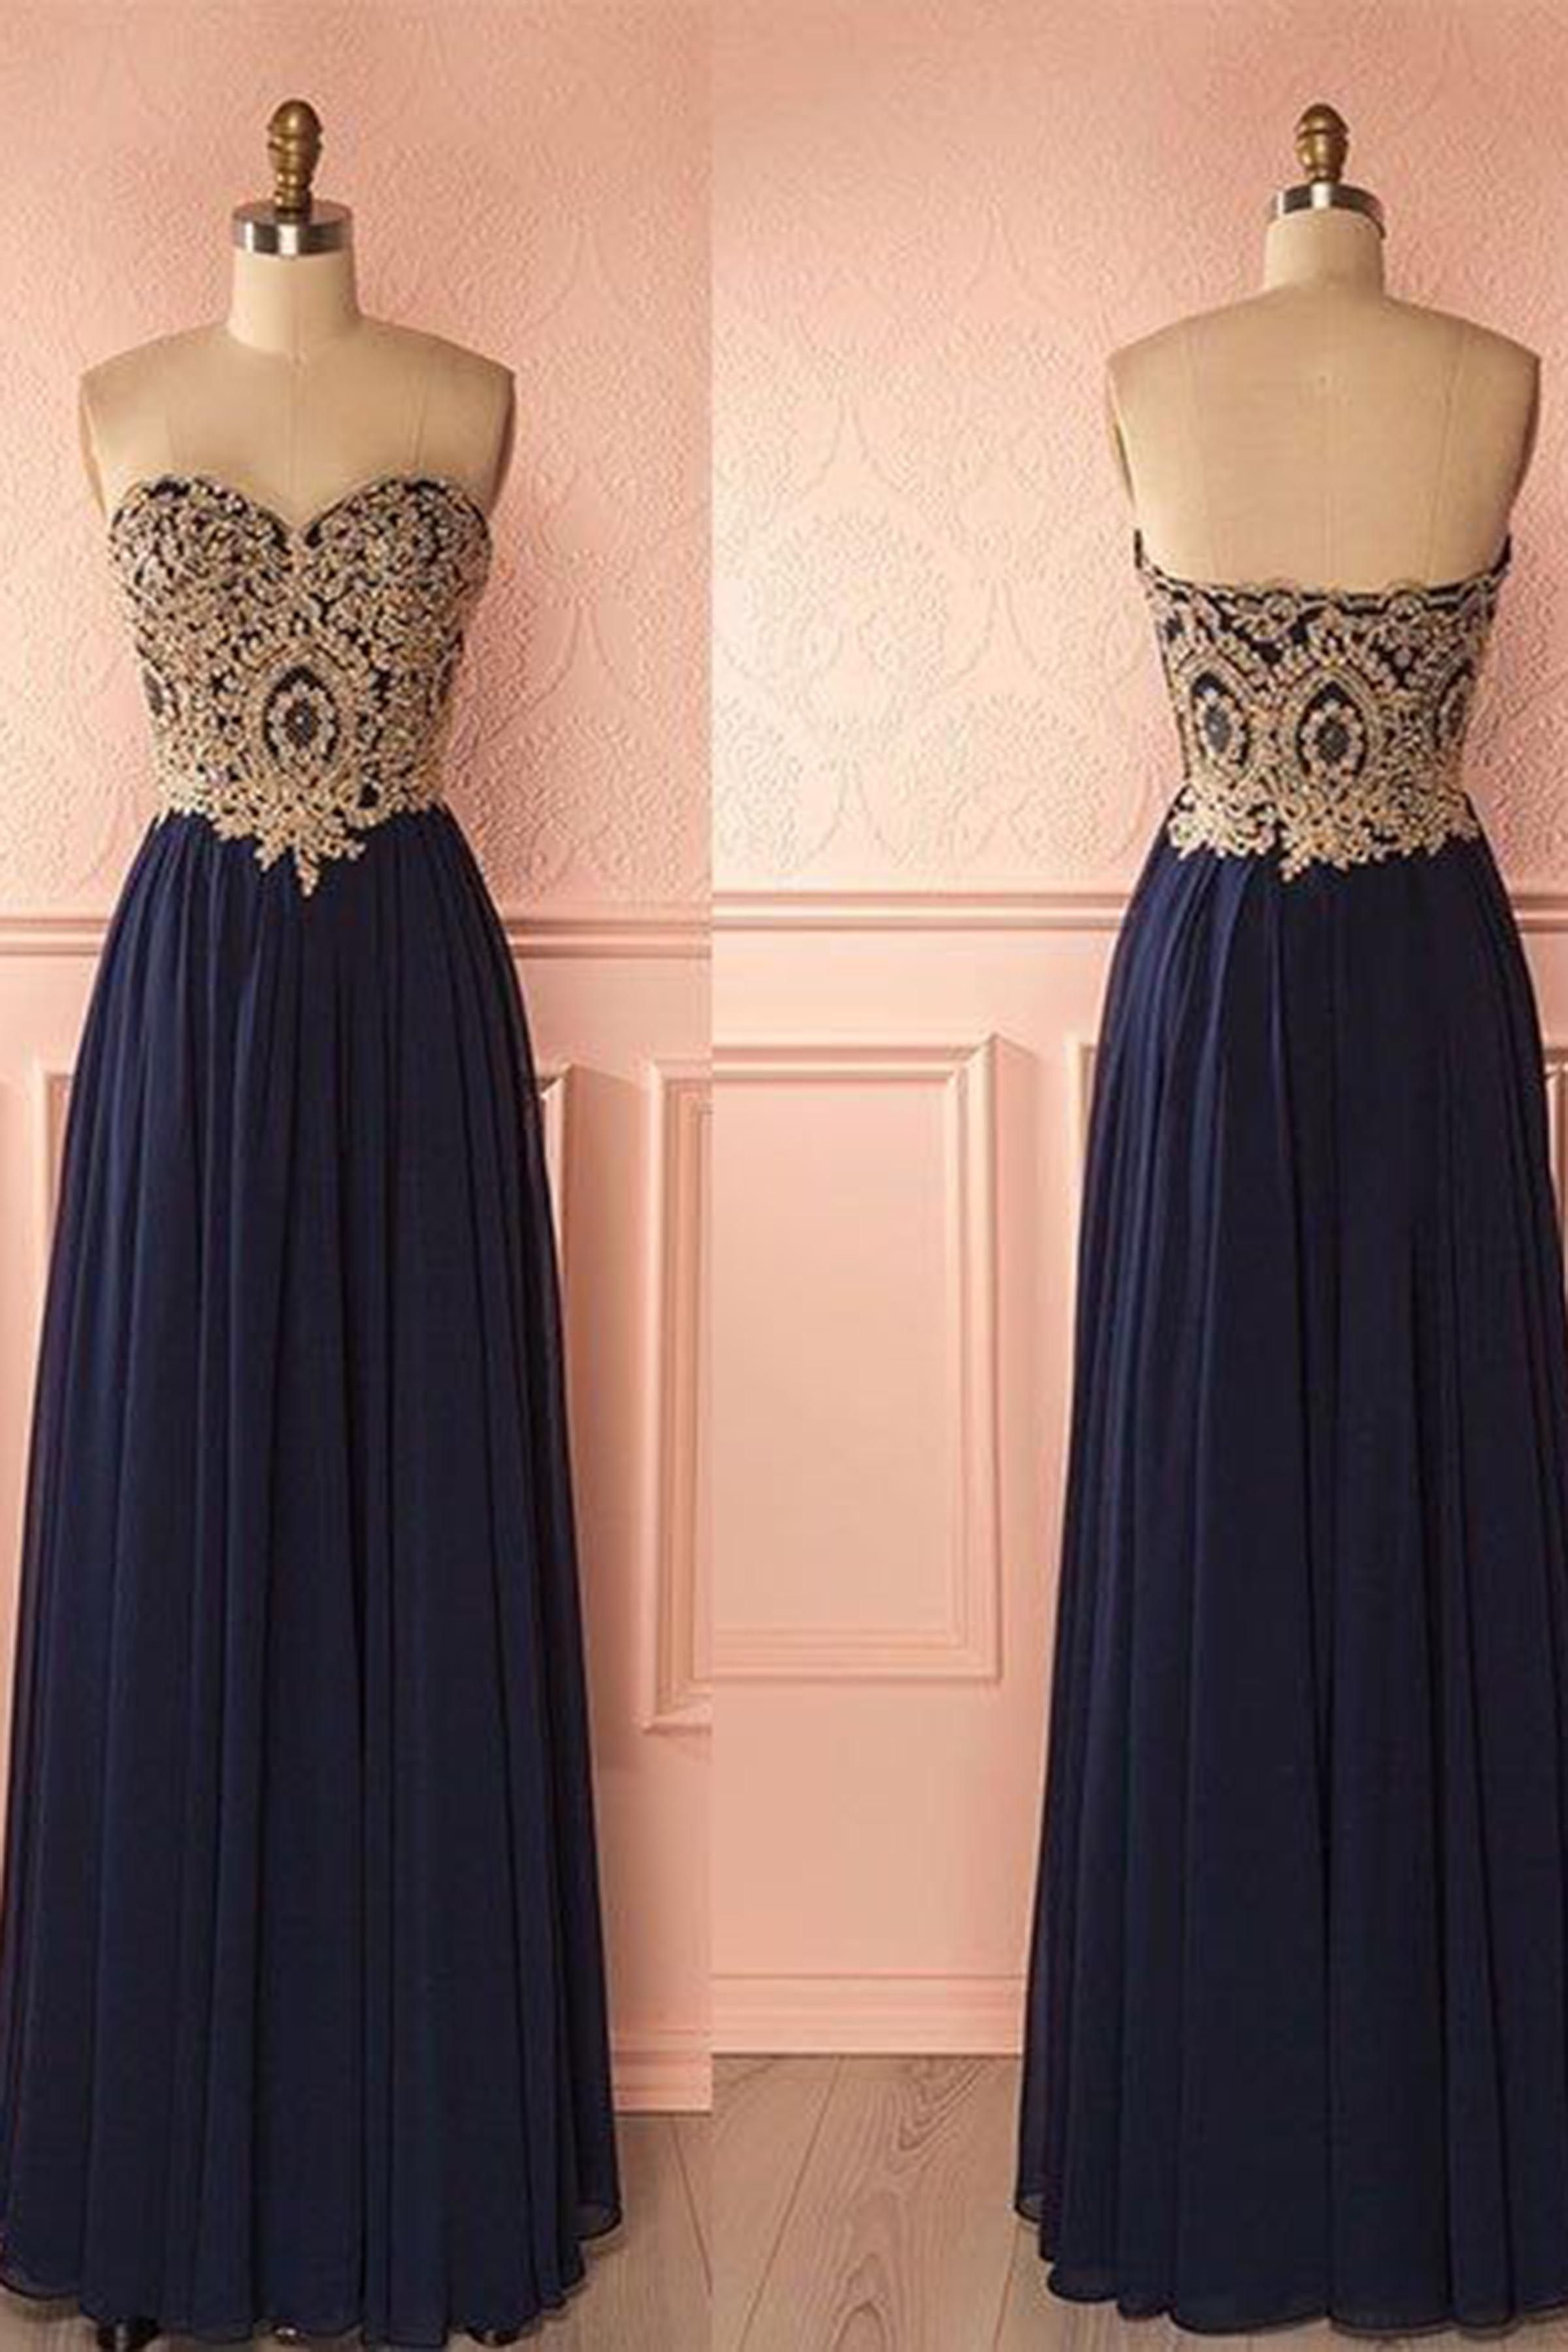 Chiffon prom dress ball gown cute lace top blue chiffon long prom